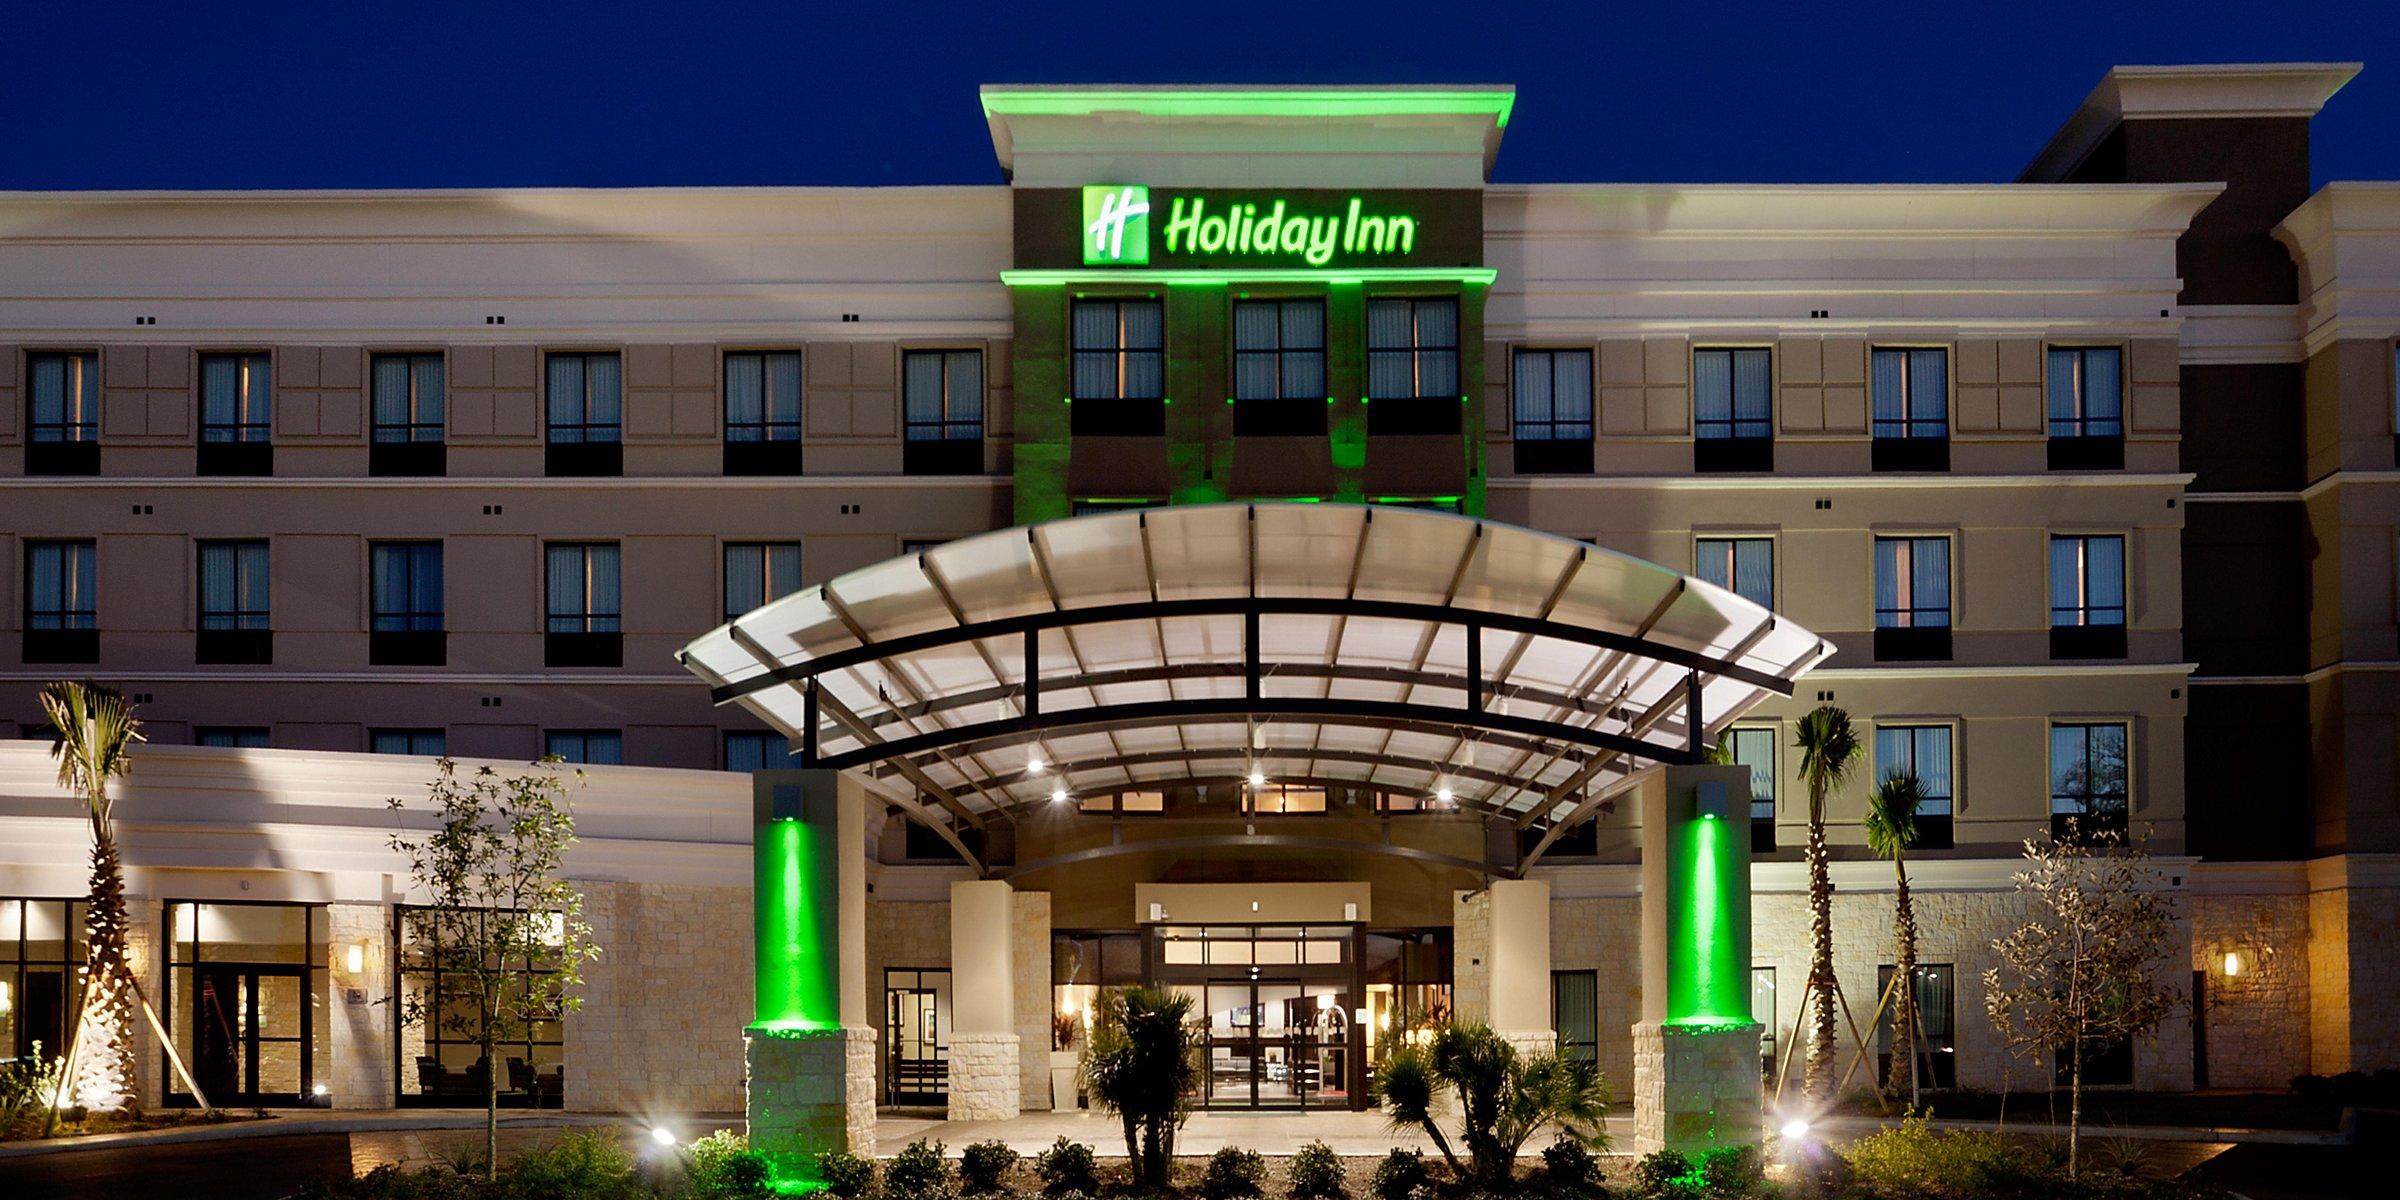 Holiday Inn San Antonio N - Stone Oak Area Hotel   Book Direct & Save